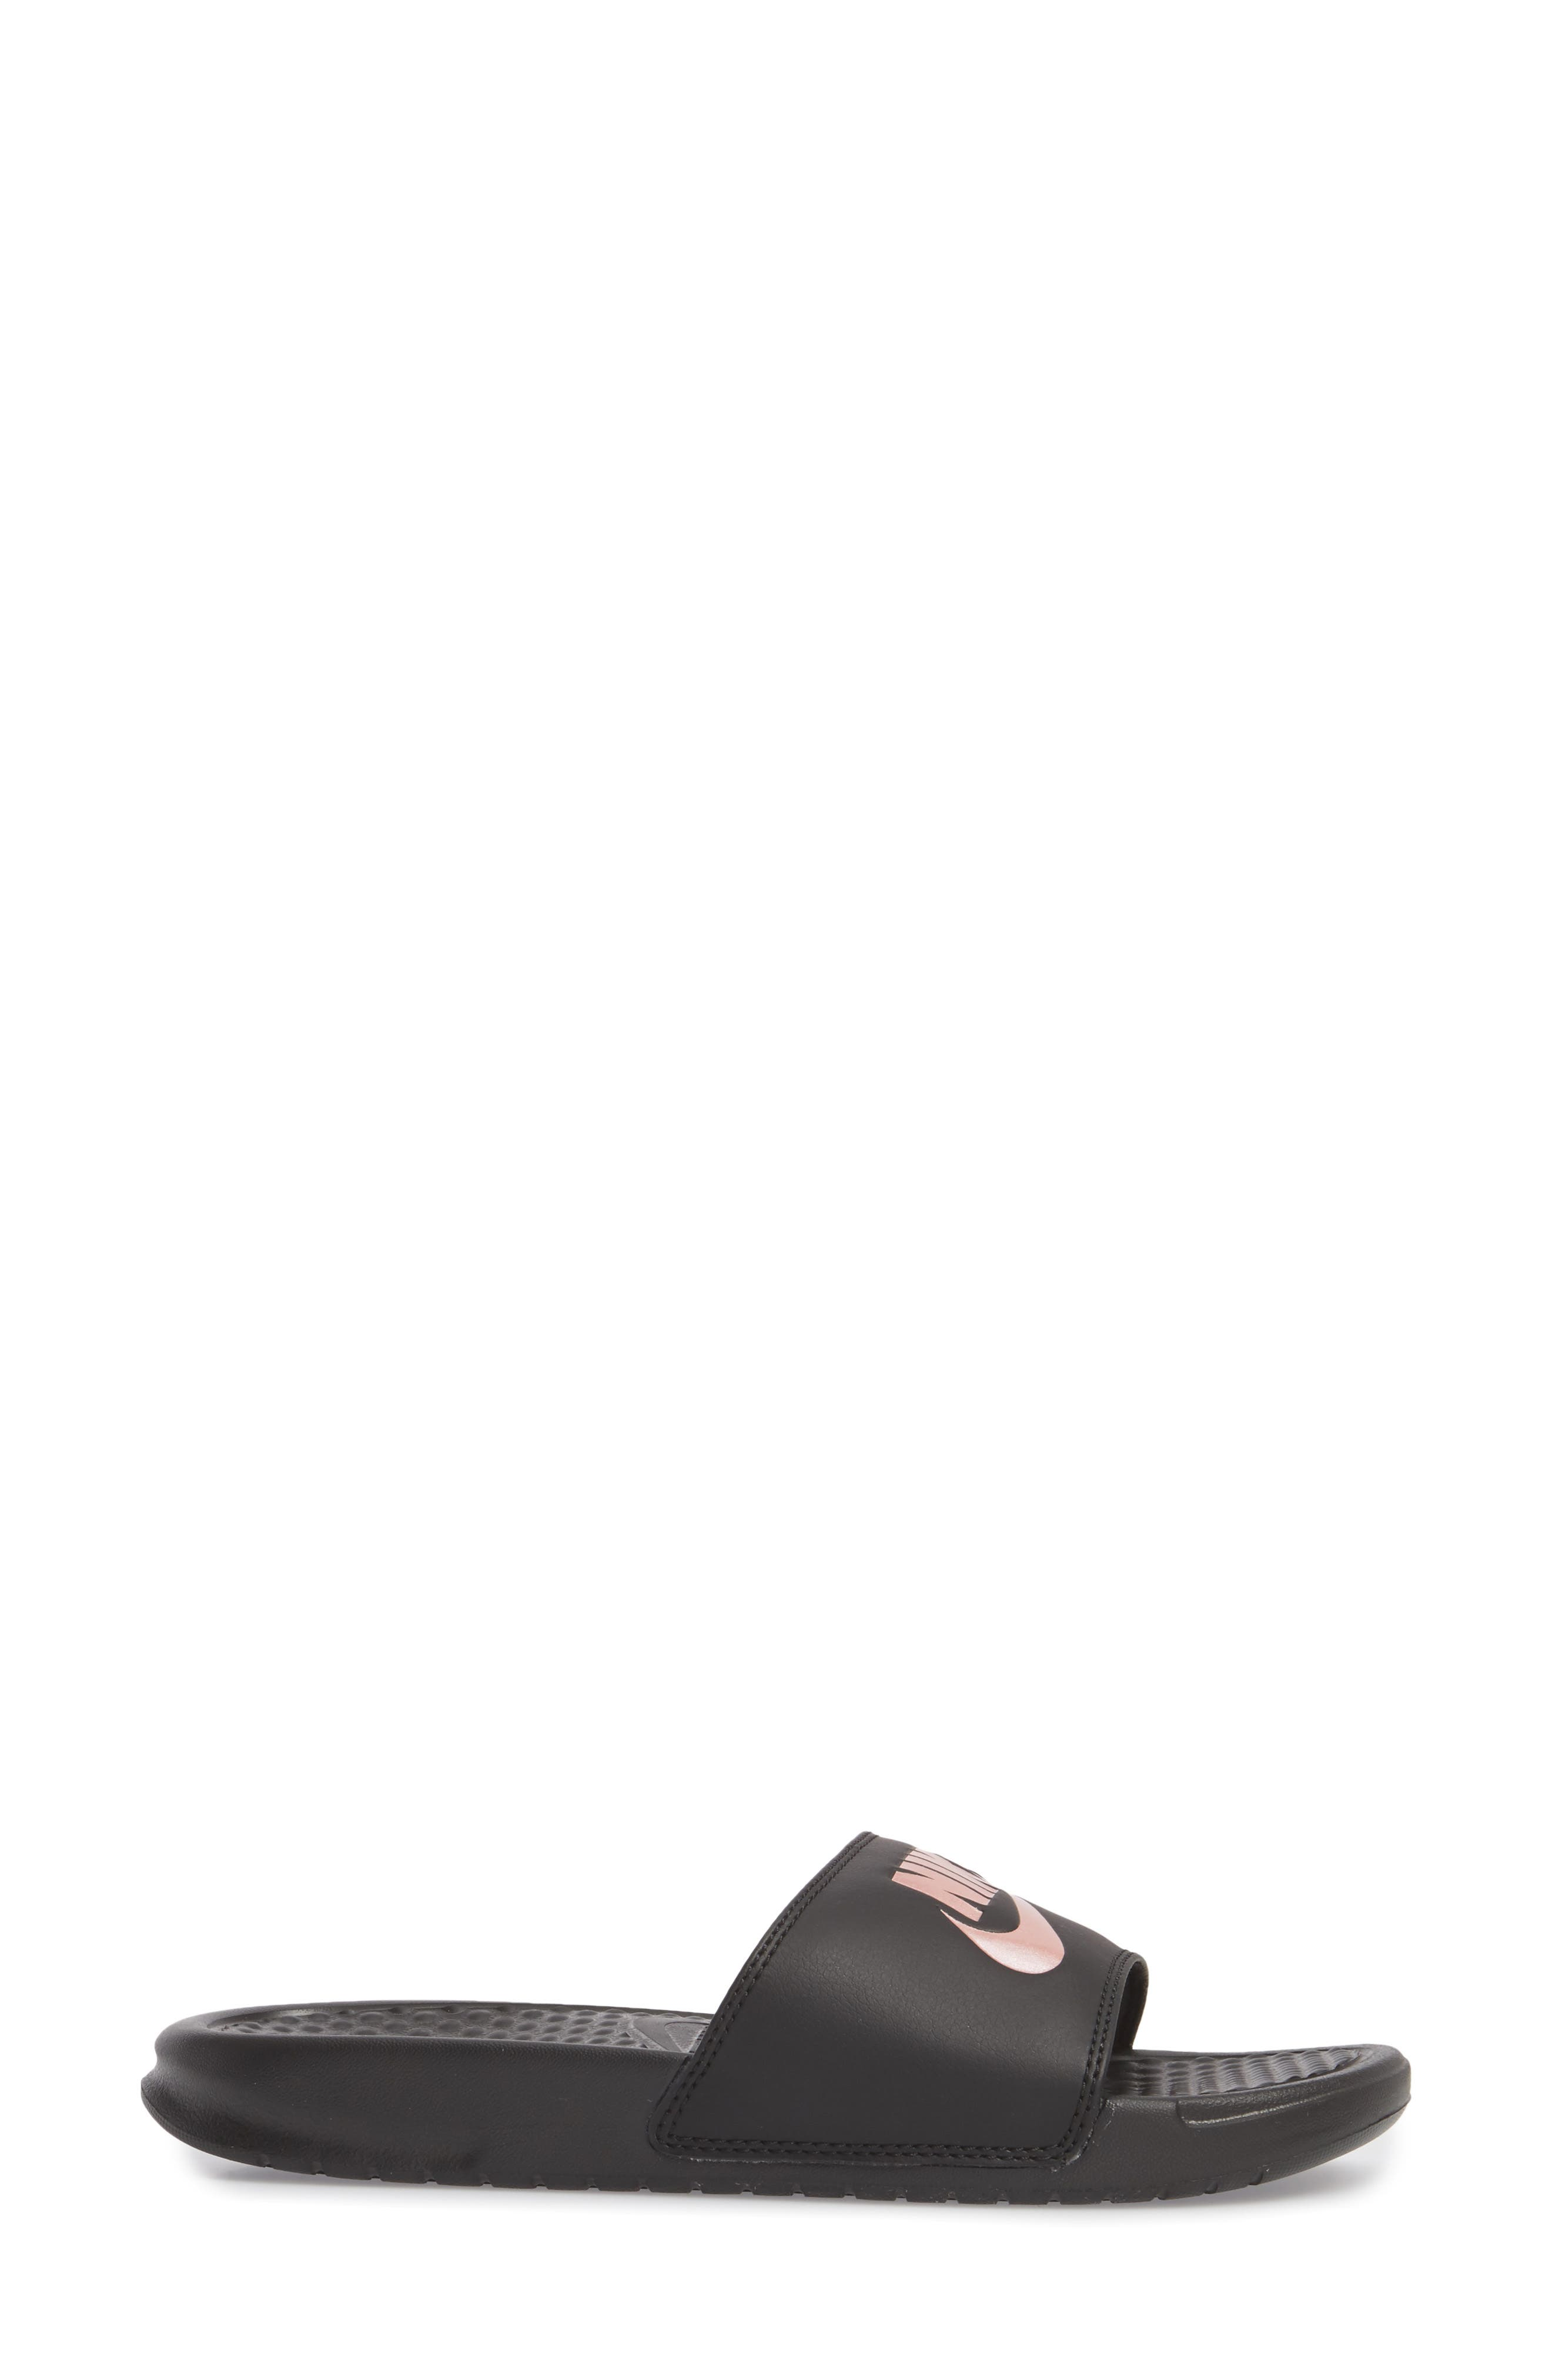 NIKE, Benassi JDI Slide Sandal, Alternate thumbnail 3, color, BLACK/ ROSE GOLD